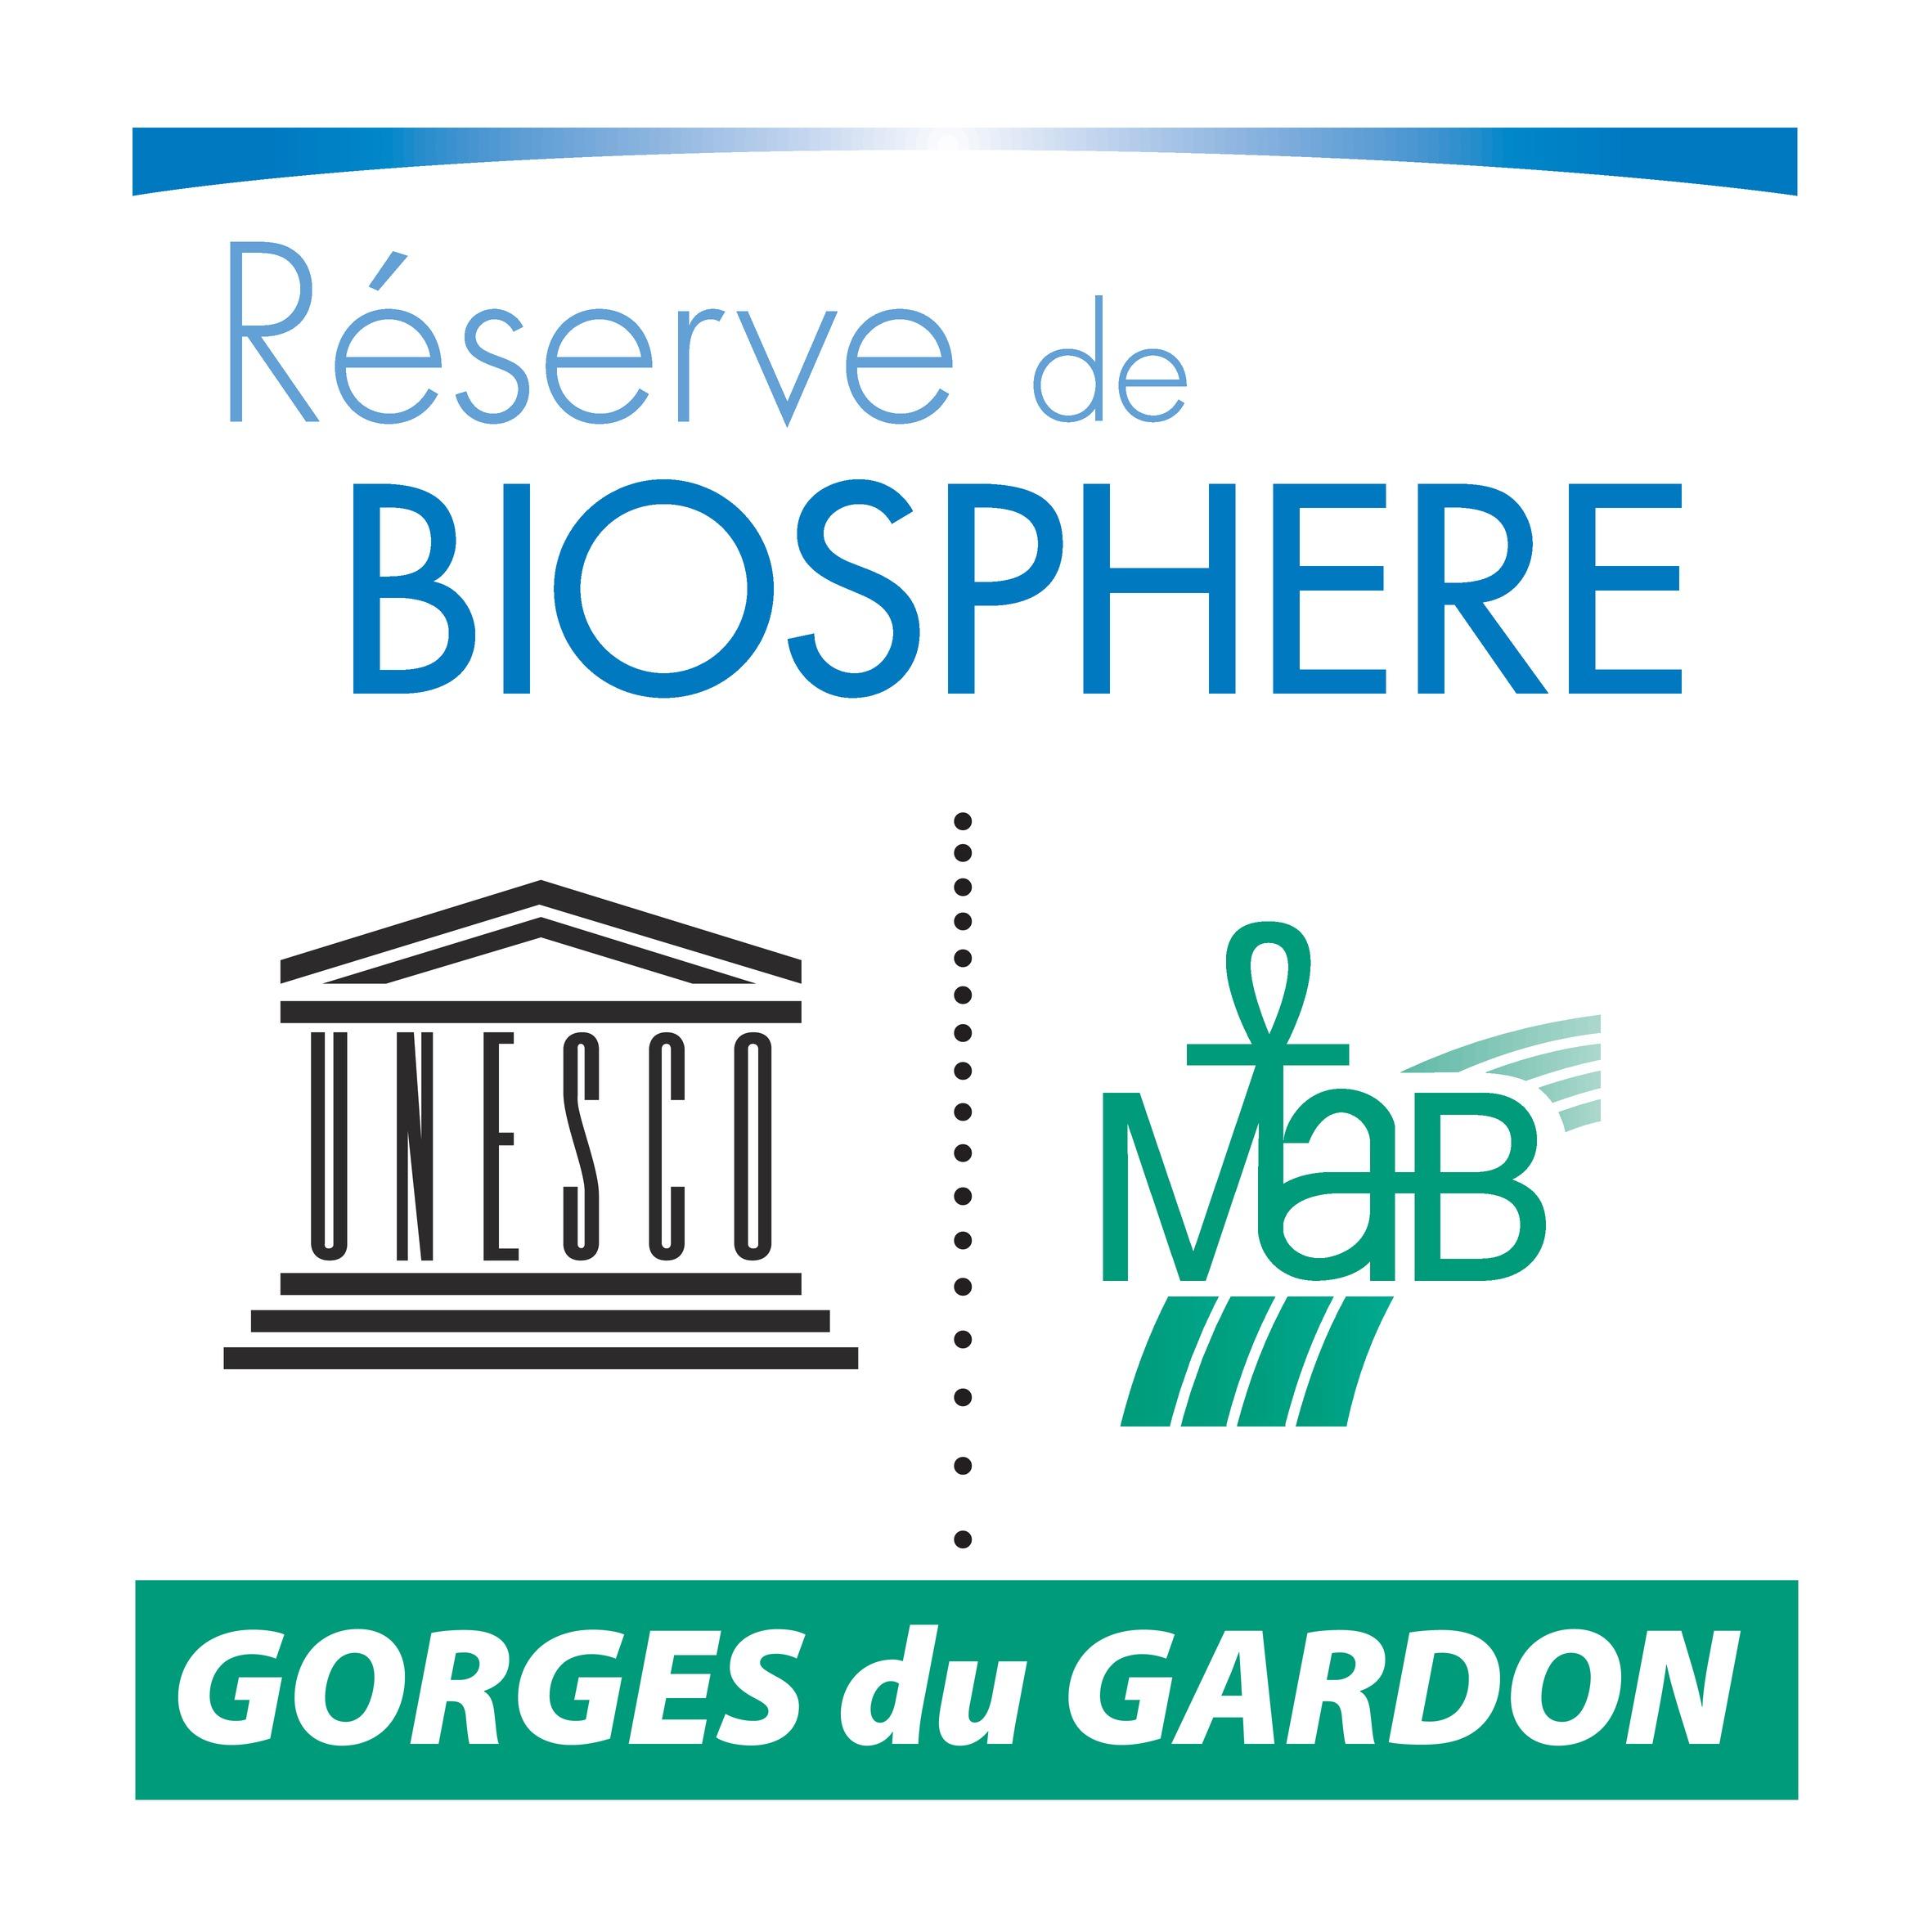 logo_gorges_du_gardon-page0